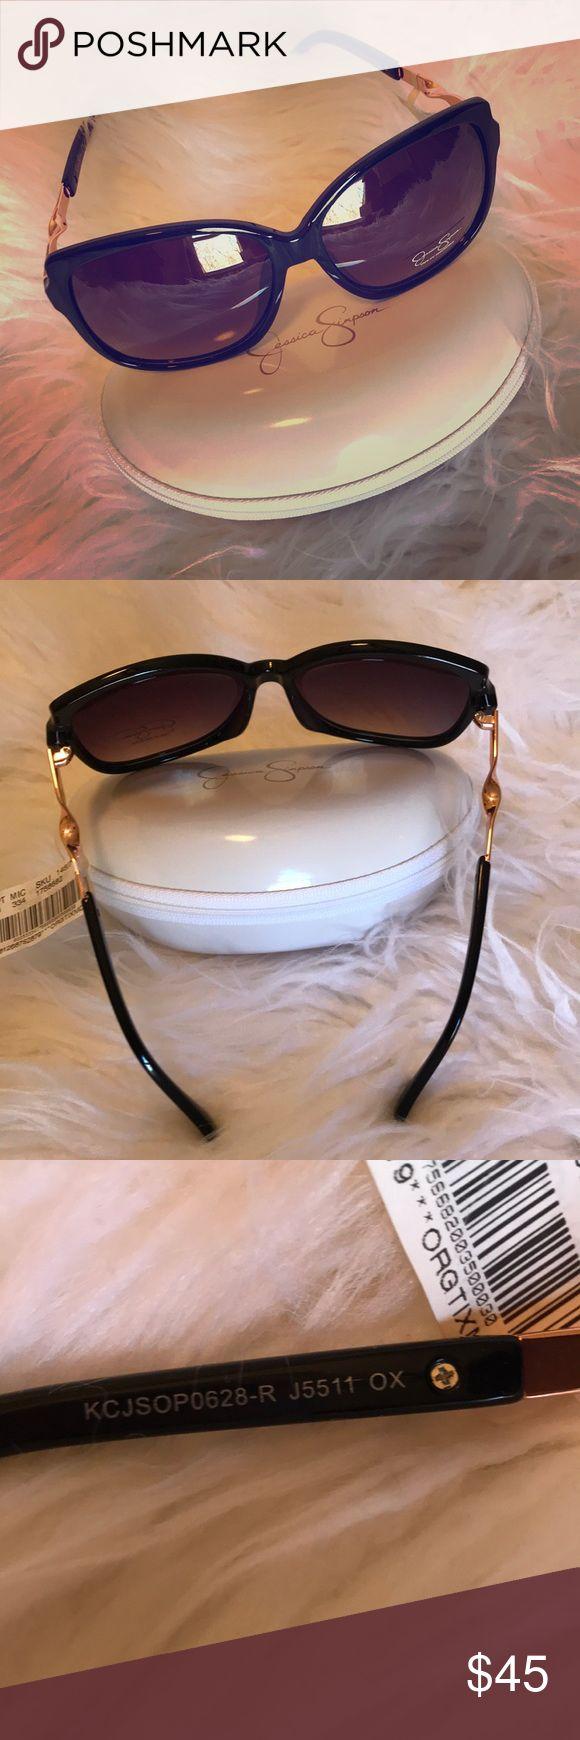 NWT Jessica Simpson Oversized Sunglasses Black NWT Jessica Simpson Oversized Sunglasses Black Gradient Jessica Simpson Accessories Sunglasses